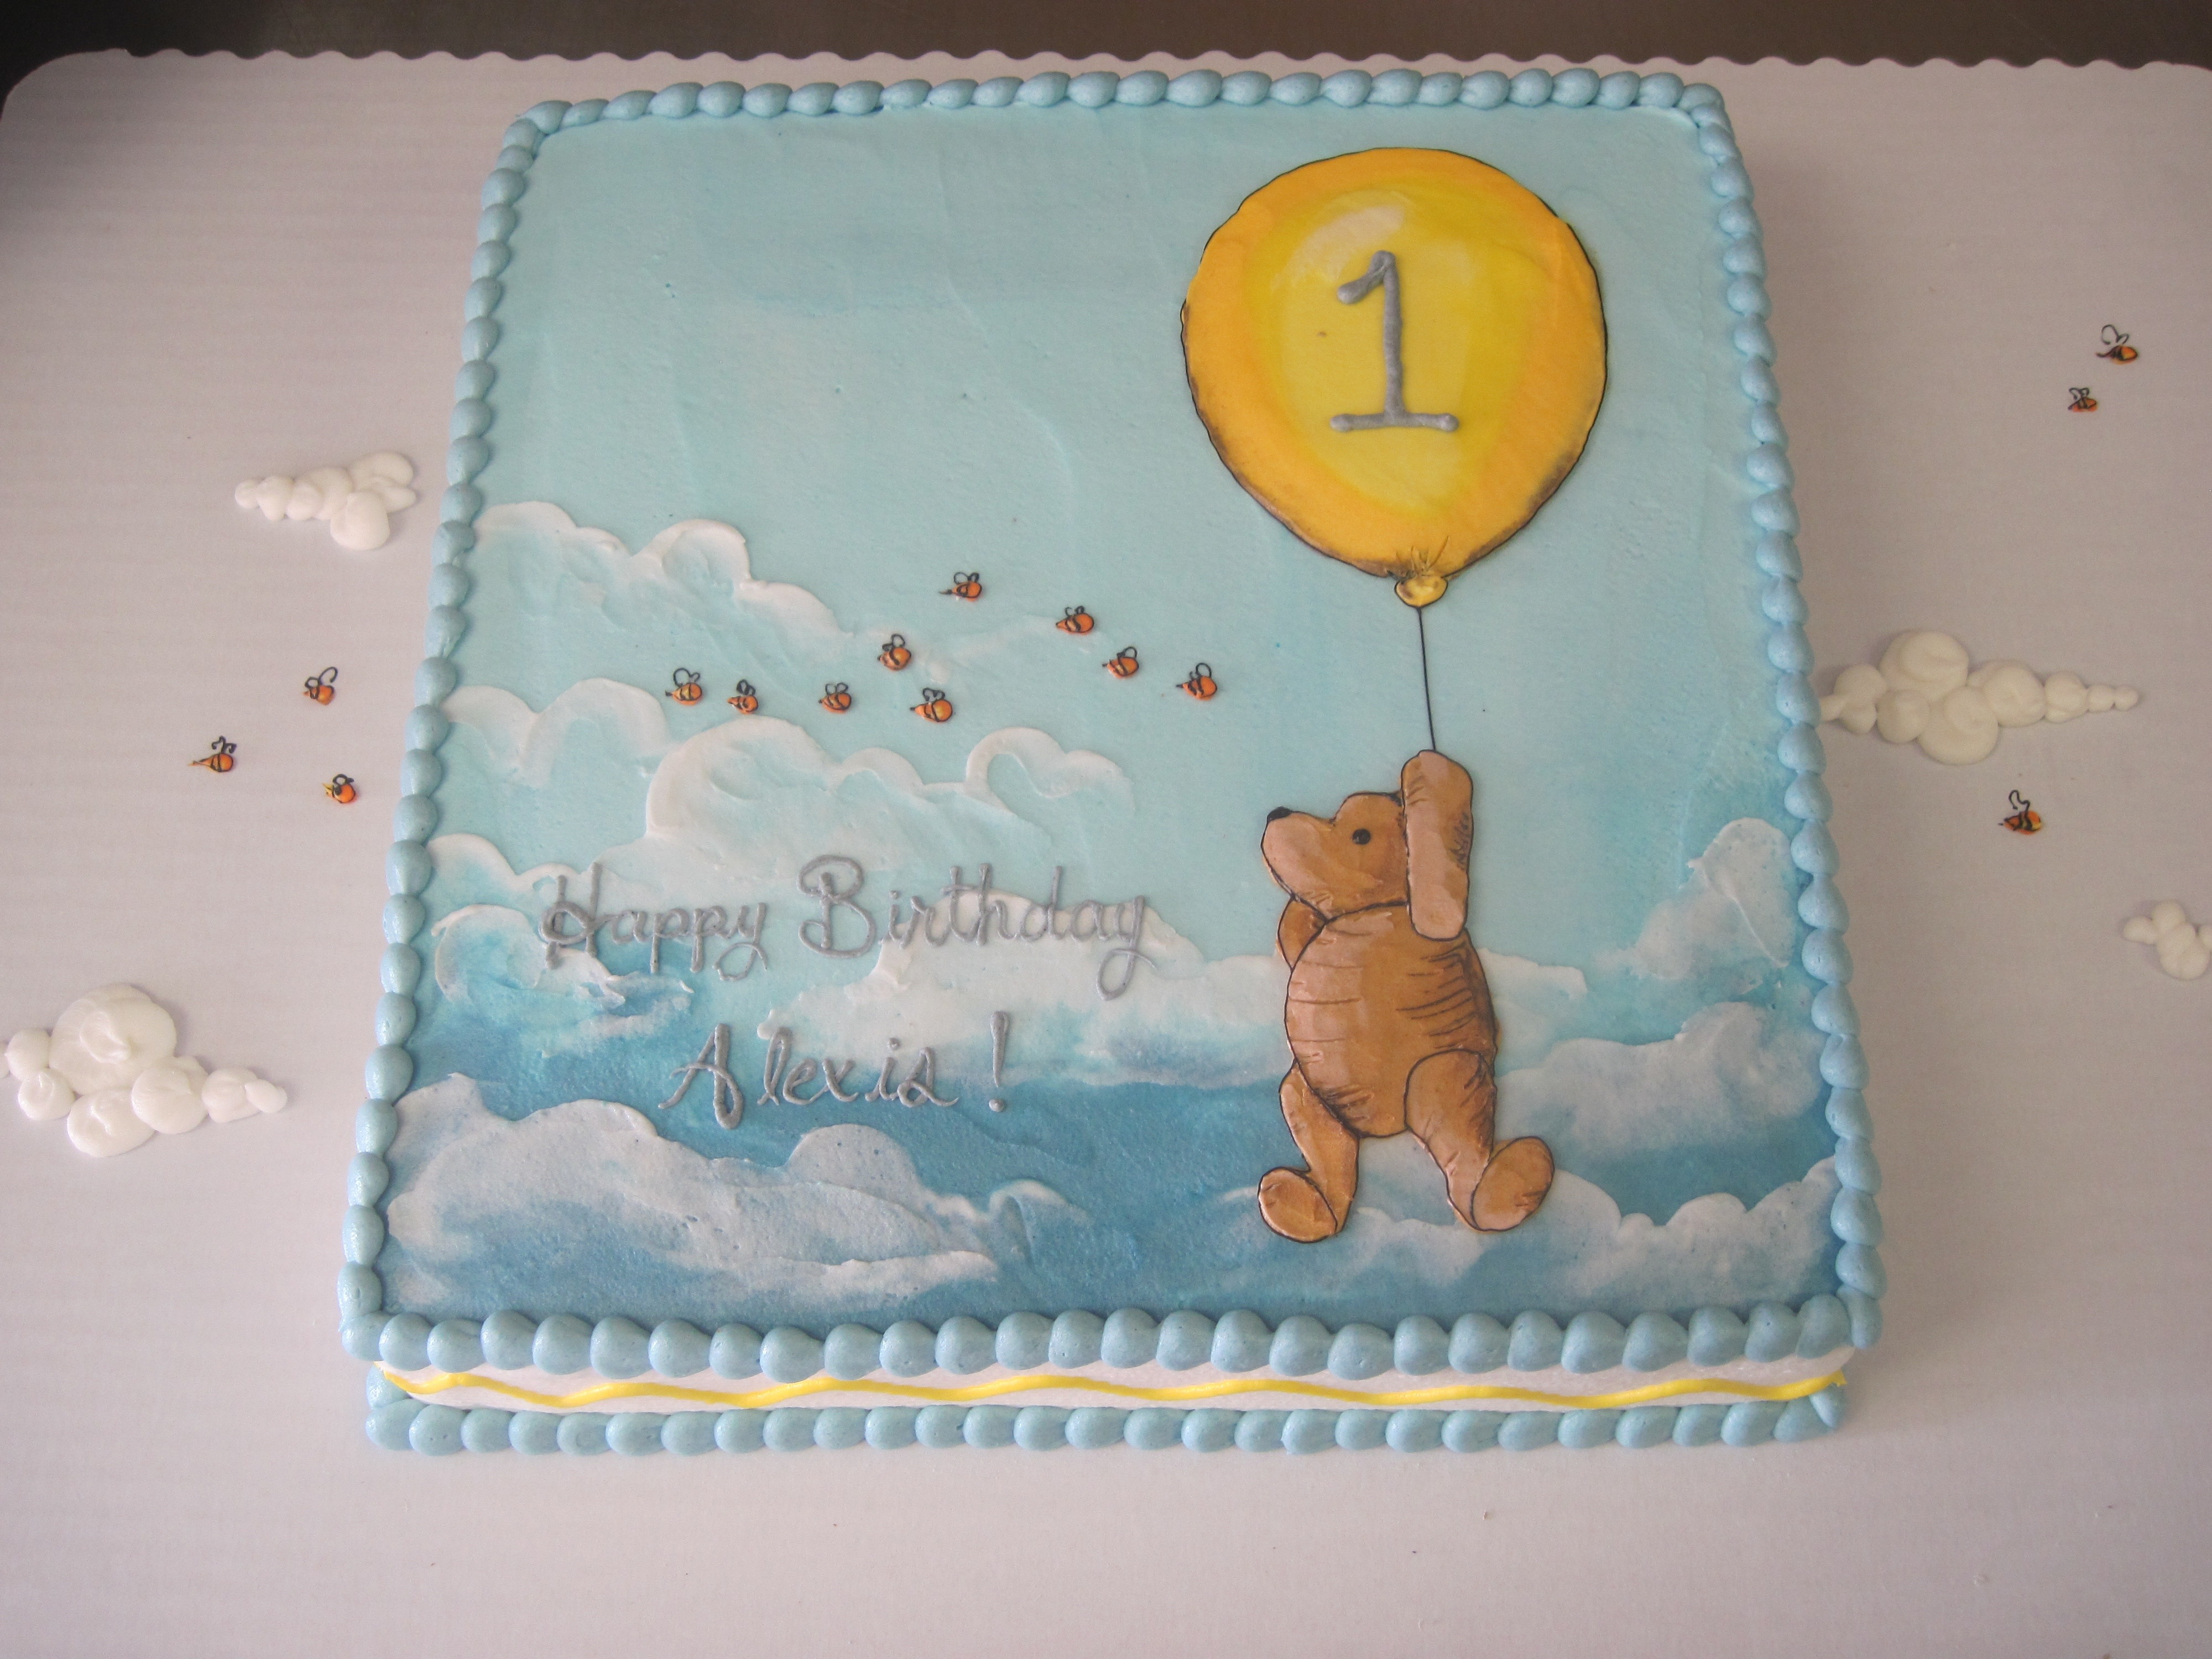 Classic Winnie the Pooh Book Cake